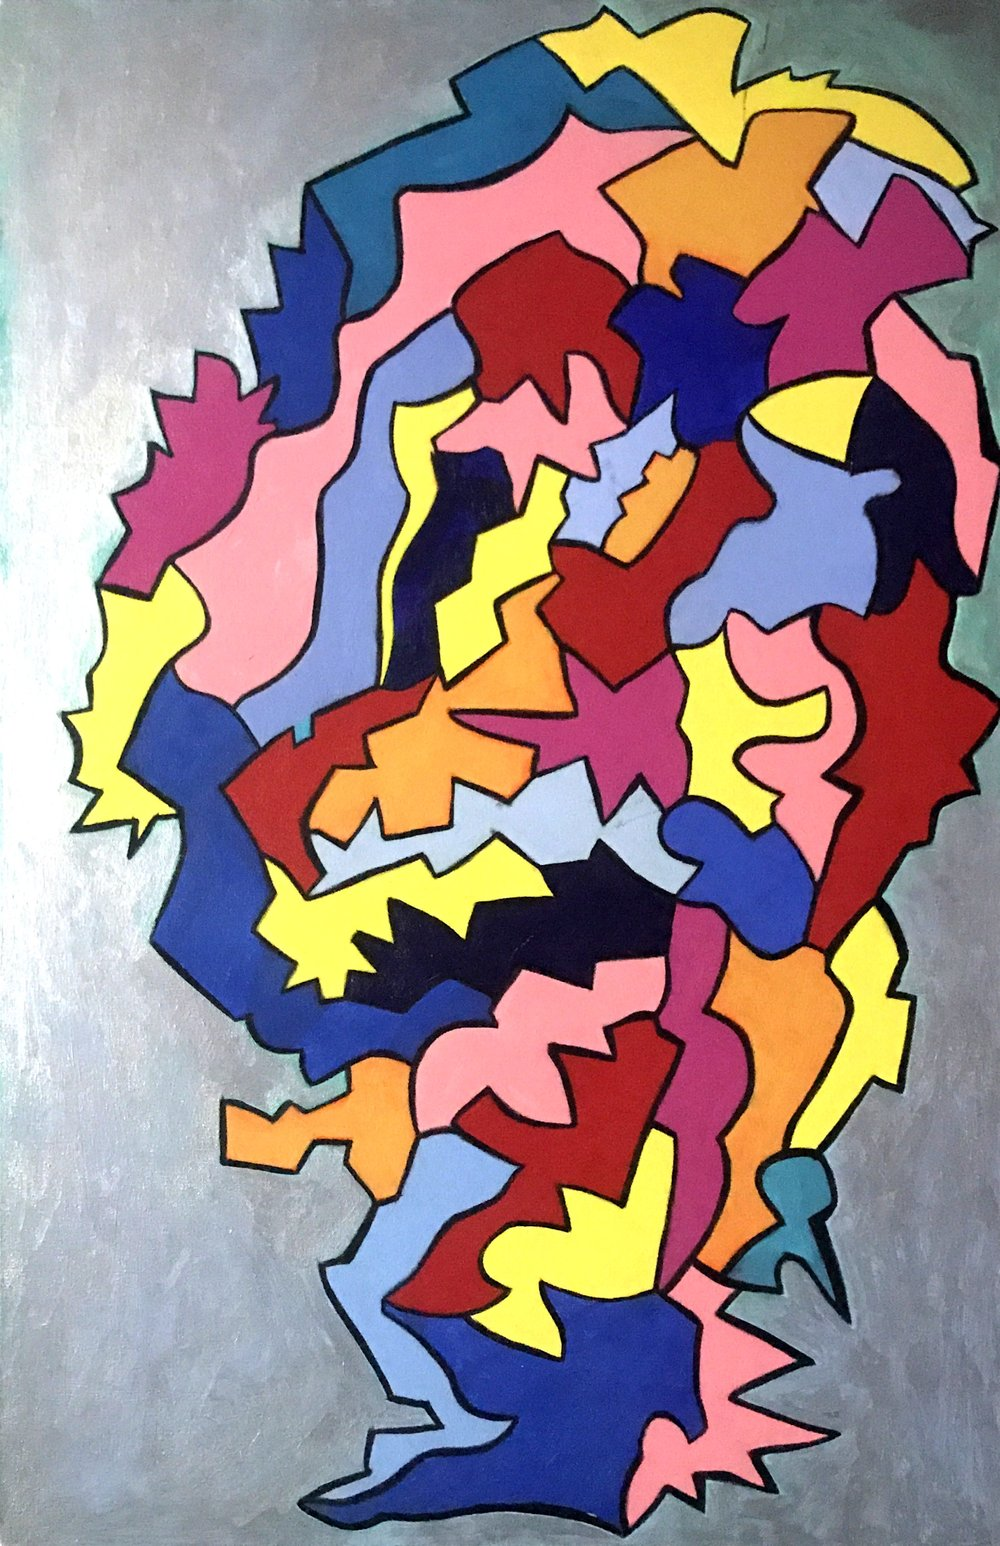 Inner Workings of a Heart. 24x 36 in, acrylic.